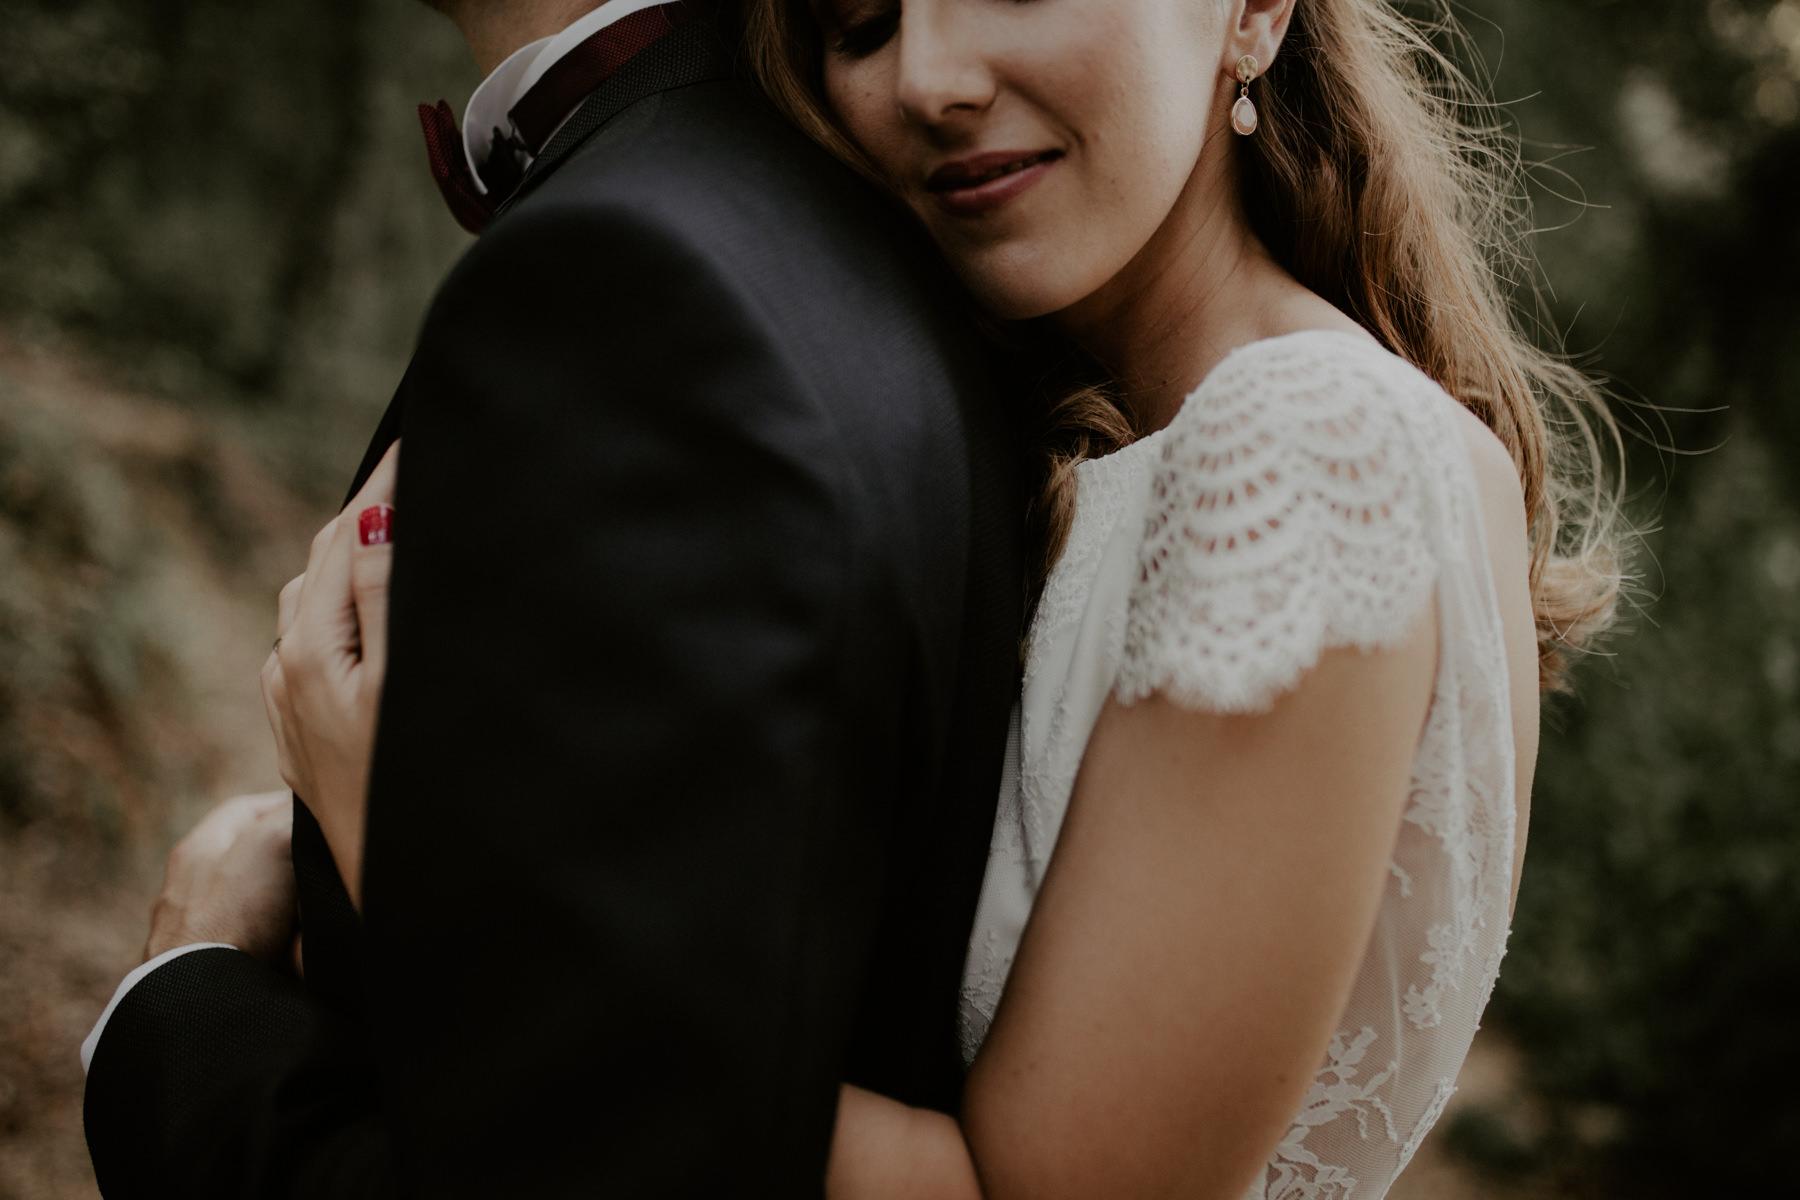 alt_thenortherngirlphotography_couples_weddingphotographer_photographer_wedding_boda_fotografodebodas_fotografobodasbarcelona_bodaindie_bodasconestilo_bodaensantperedeclara_jennifermiguel-517.jpg